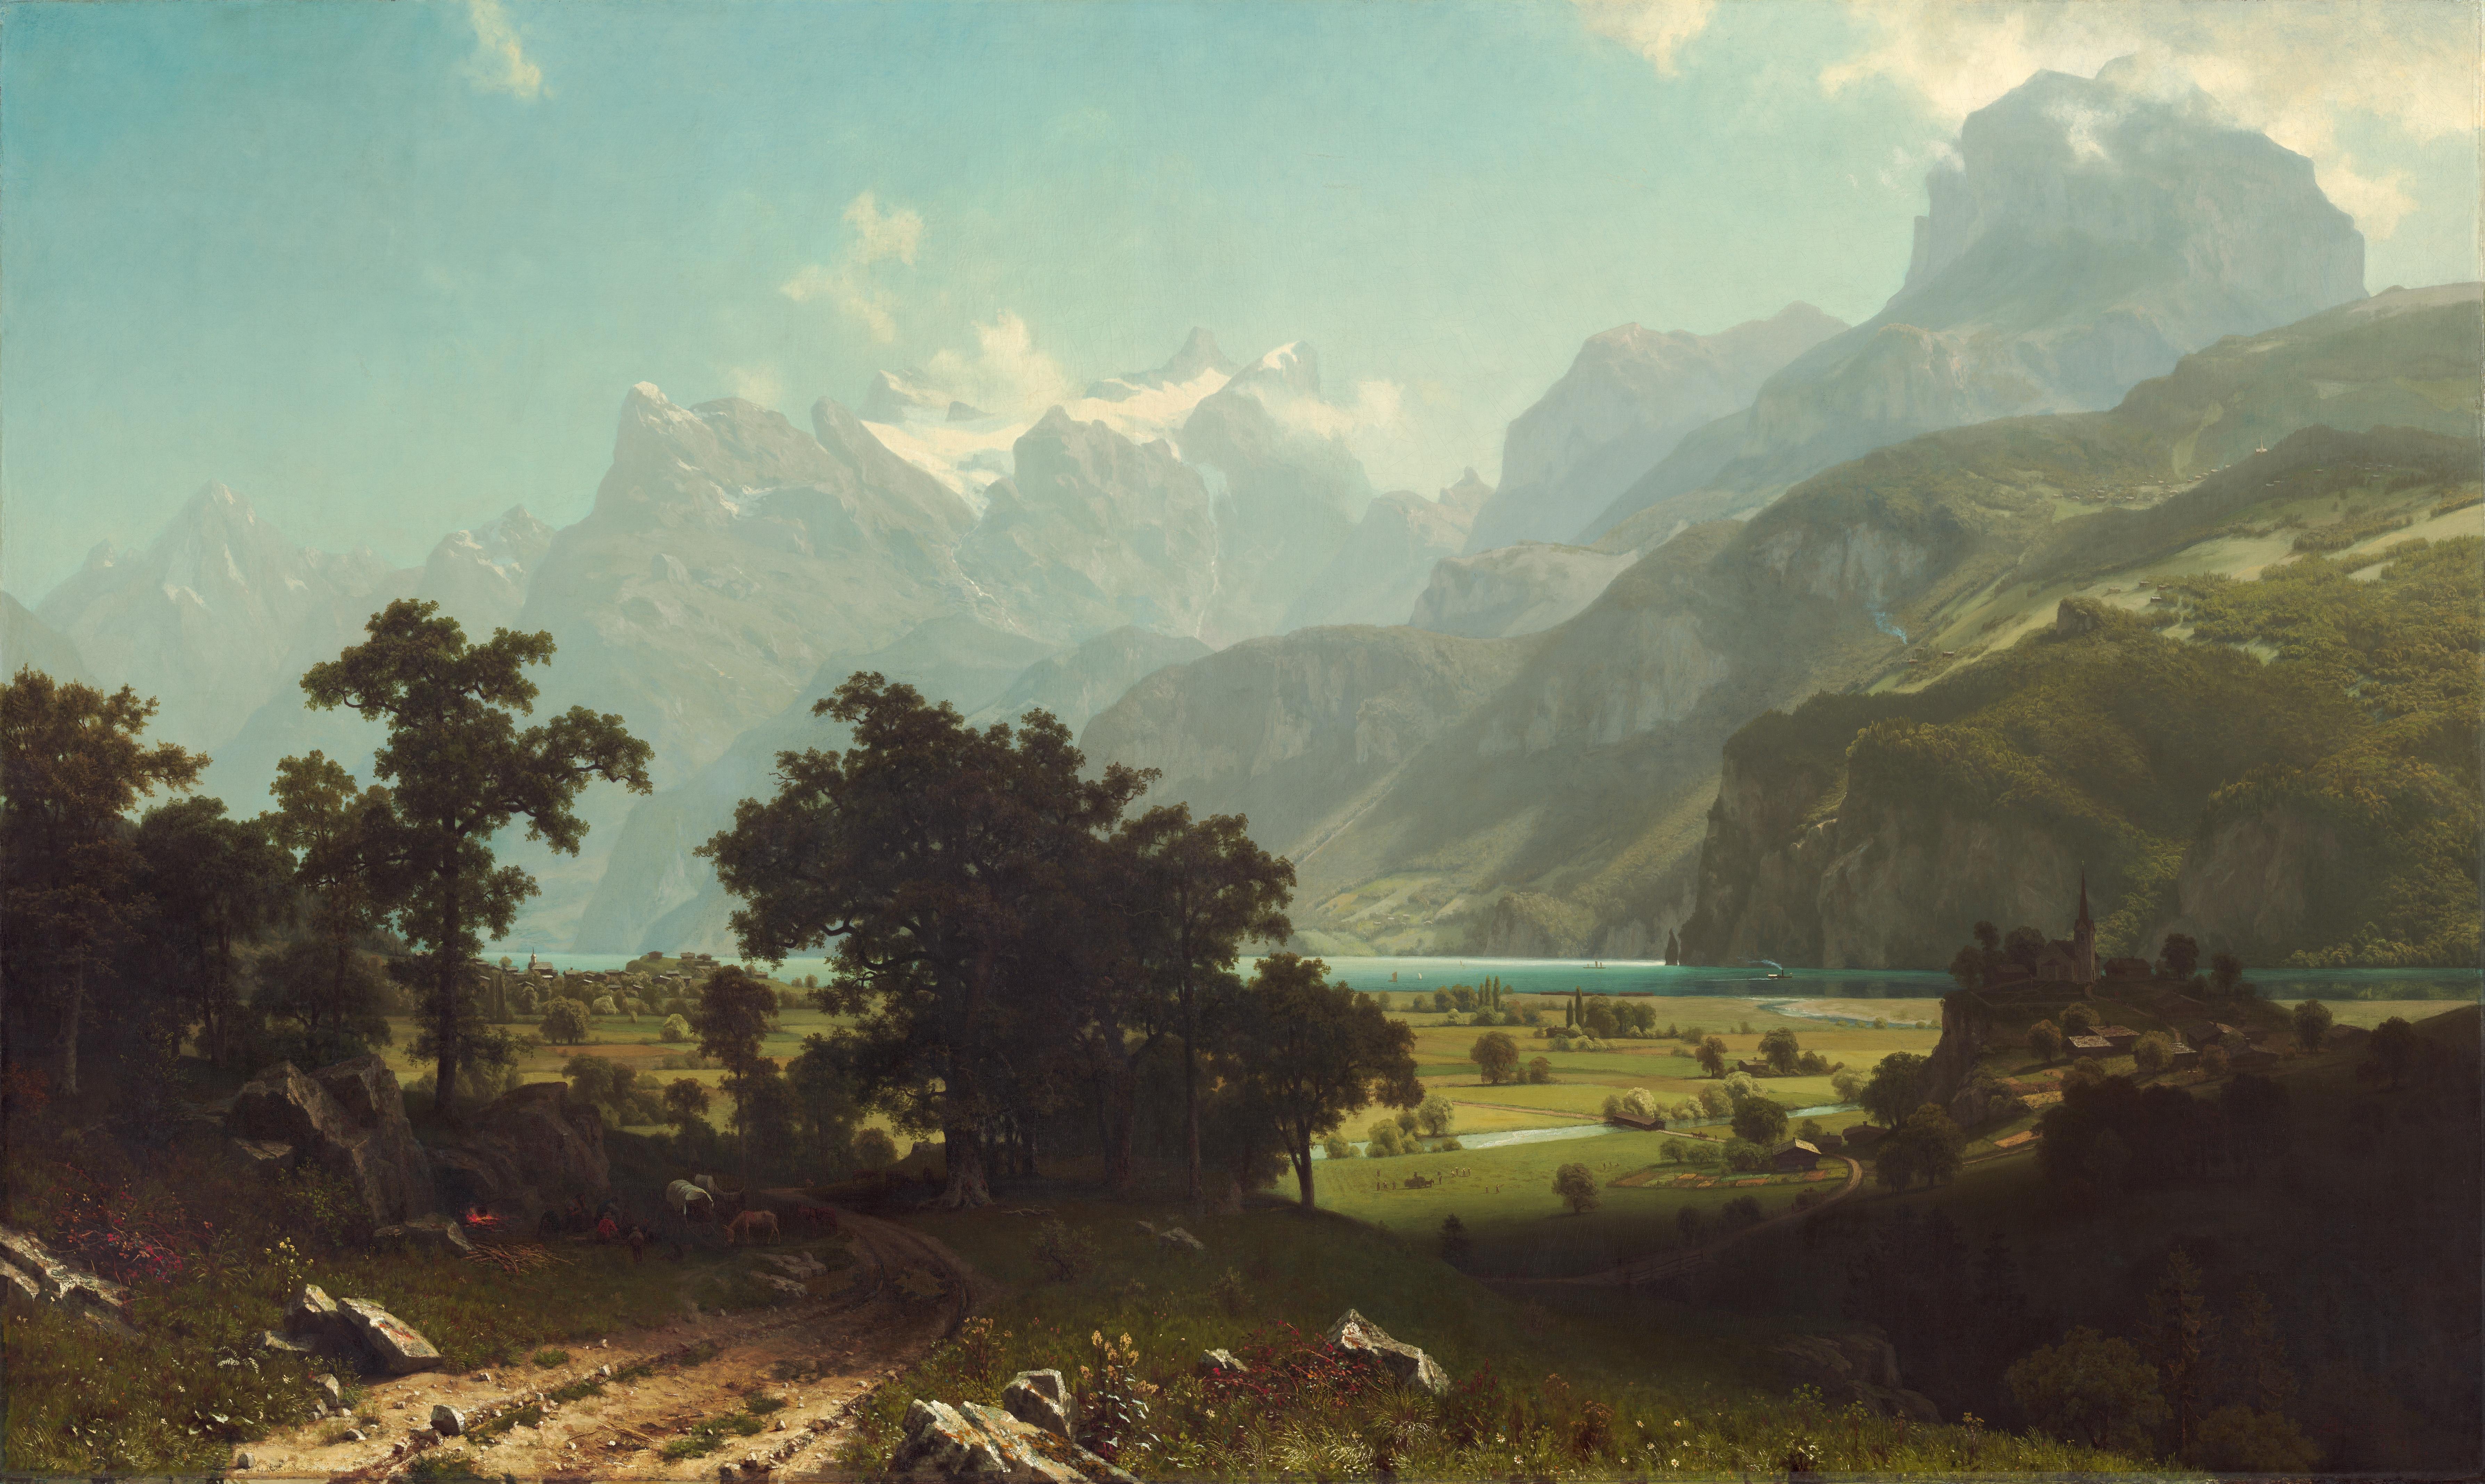 https://upload.wikimedia.org/wikipedia/commons/9/95/Albert_Bierstadt_-_Lake_Lucerne.jpg